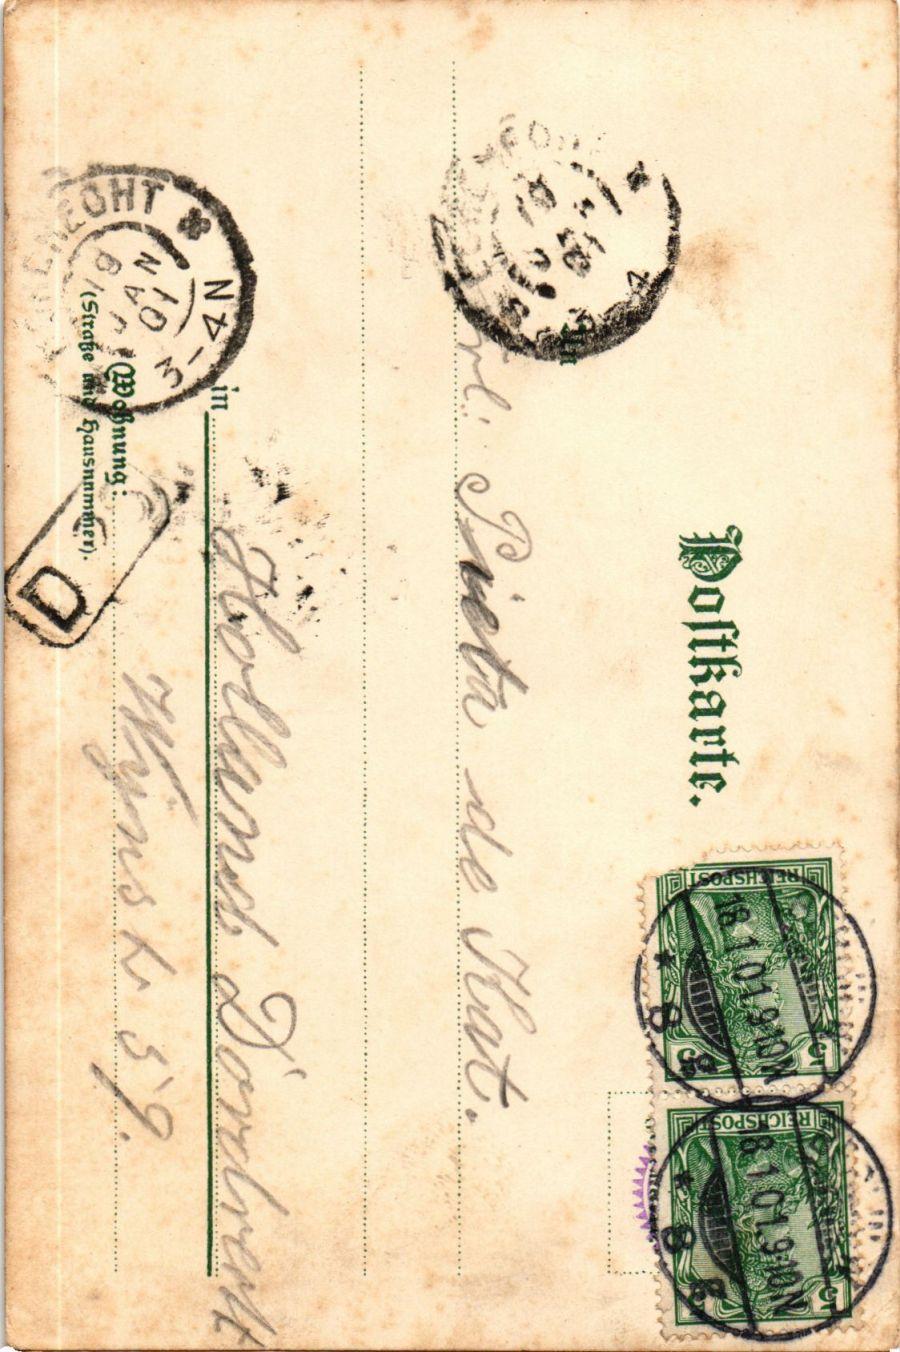 CPA-AK-EMBOSSED-Kaiser-GERMAN-ROYALTY-867611 Indexbild 2